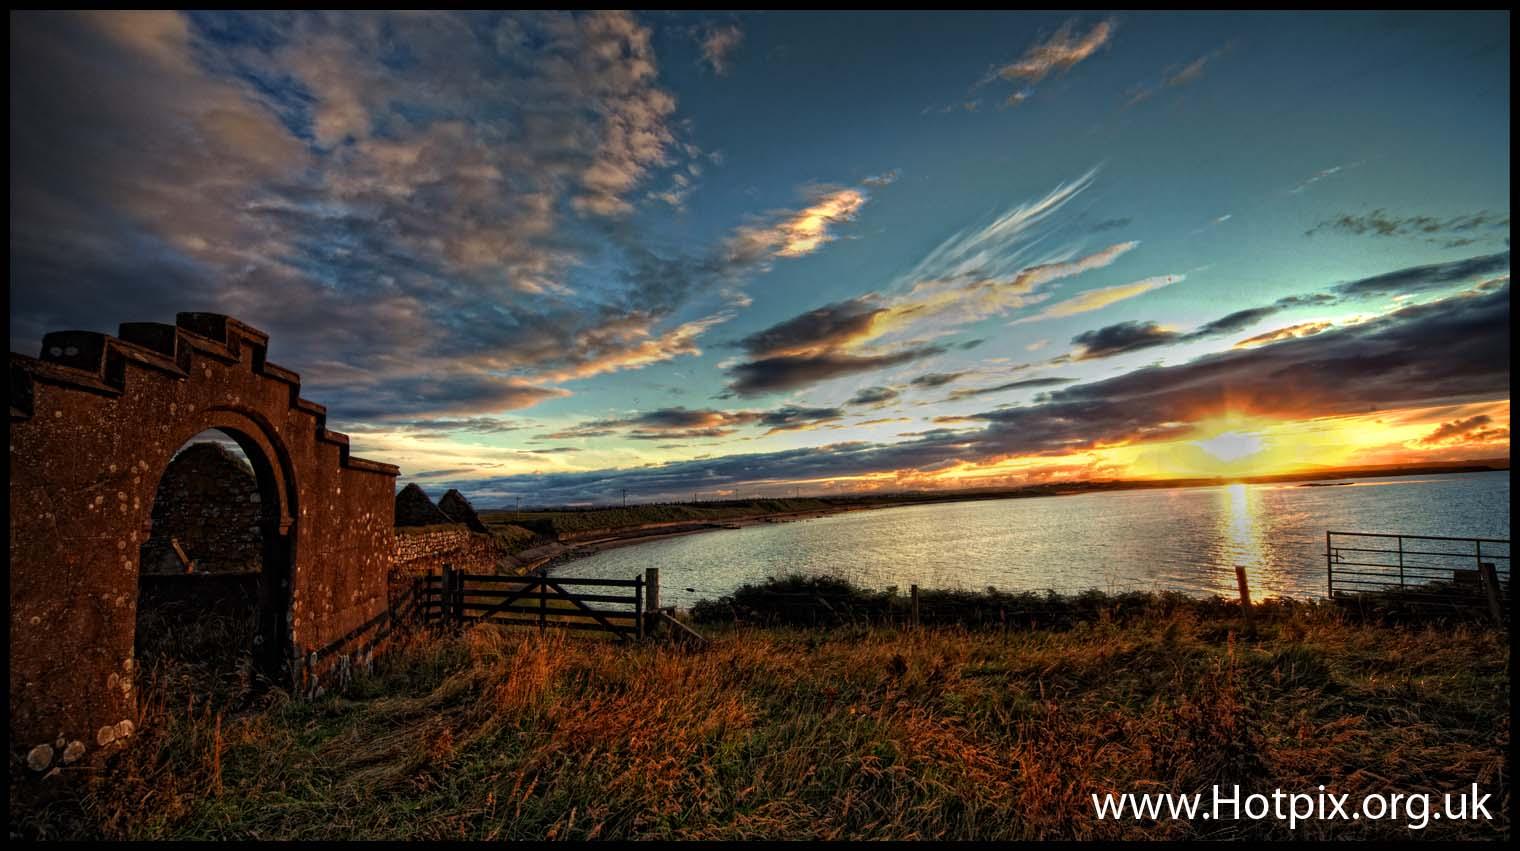 Isle,Of,Lewis,Ruins,church,St,Columbas,old,Aiginis,aignish,Scotland,Island,harris,tweed,tourist,B&B,bed,breakfast,Stornoway,sea,sunset,HDR,stone,gate,waves,lapping,dusk,summer,autumn,evening,tonysmith,tony,smith,hotpix,tonysmithotpix,pano,panorama,joiner,Columba